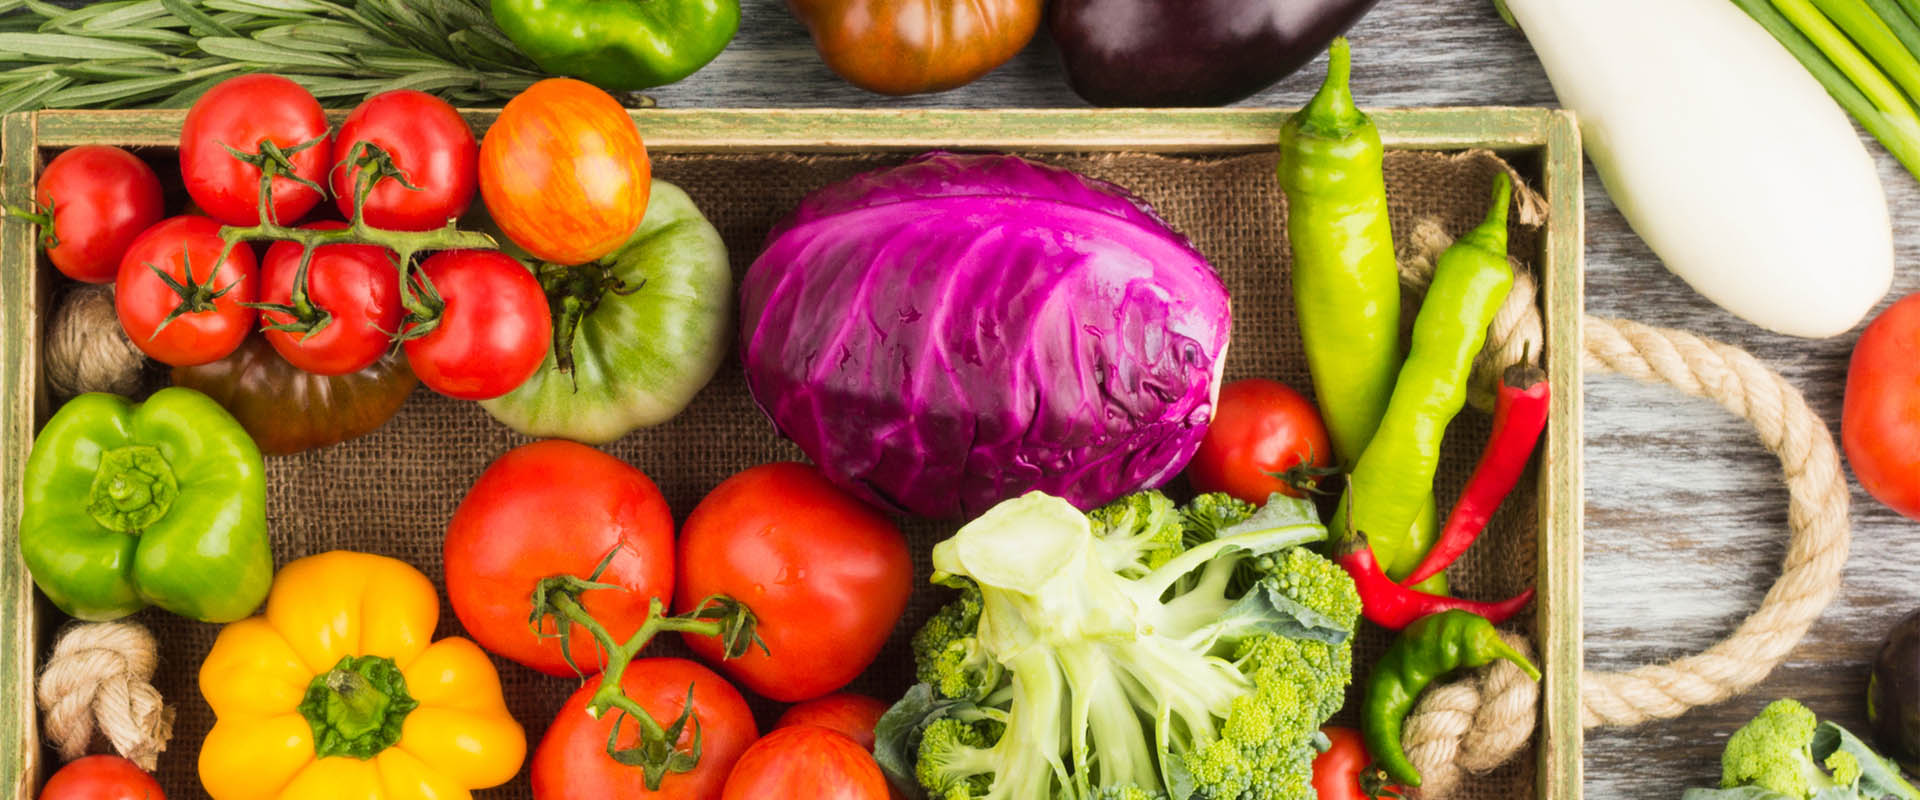 SAPORI DI MONTAGNA - pesto di verdure